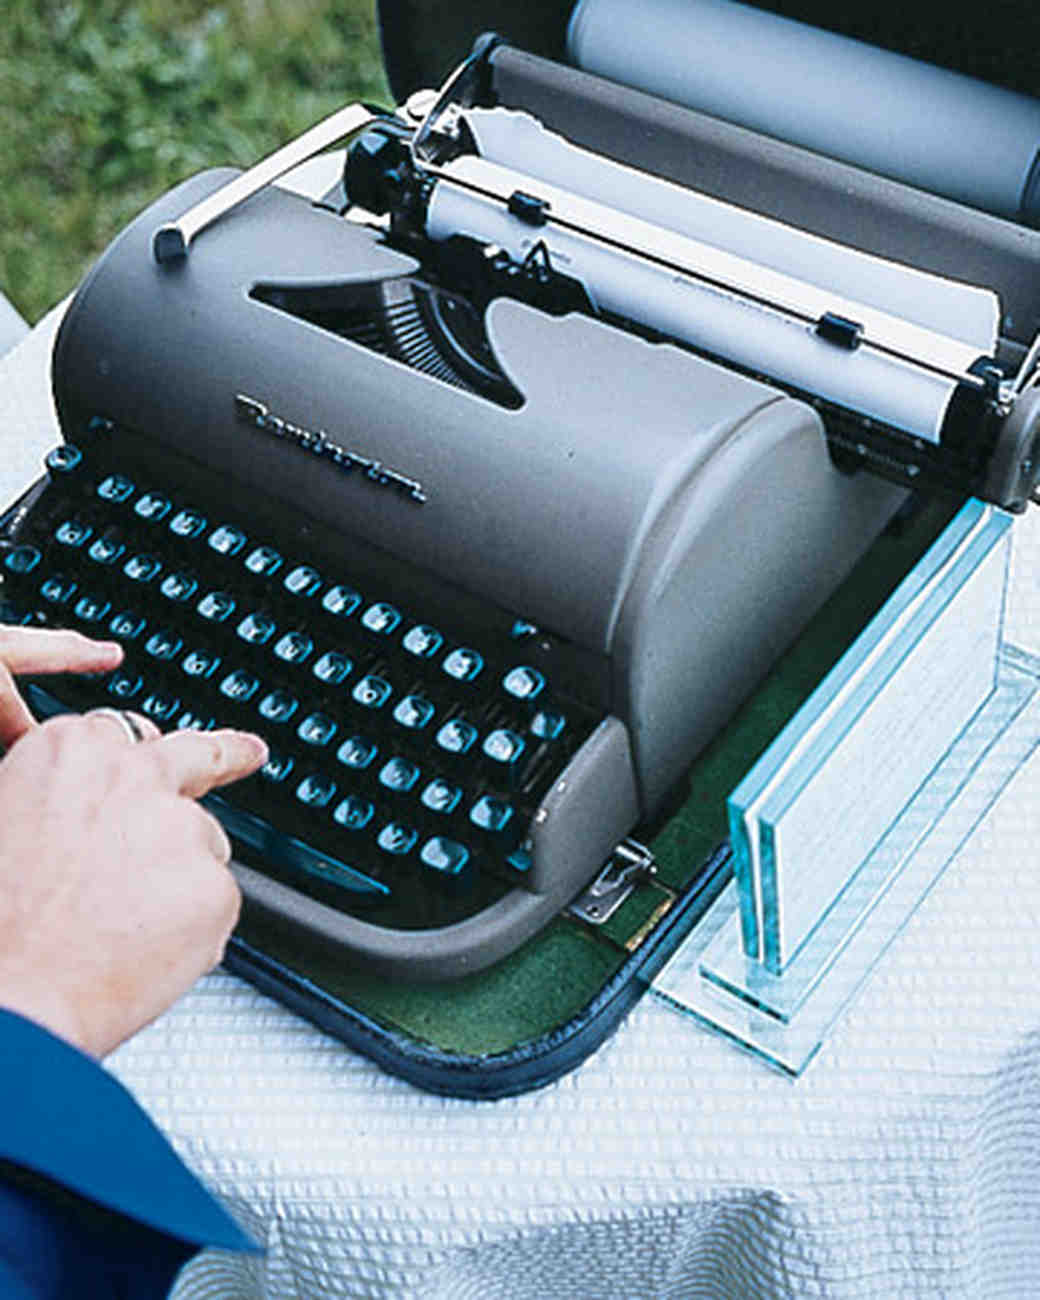 mwa102447_spr07_typewriter.jpg